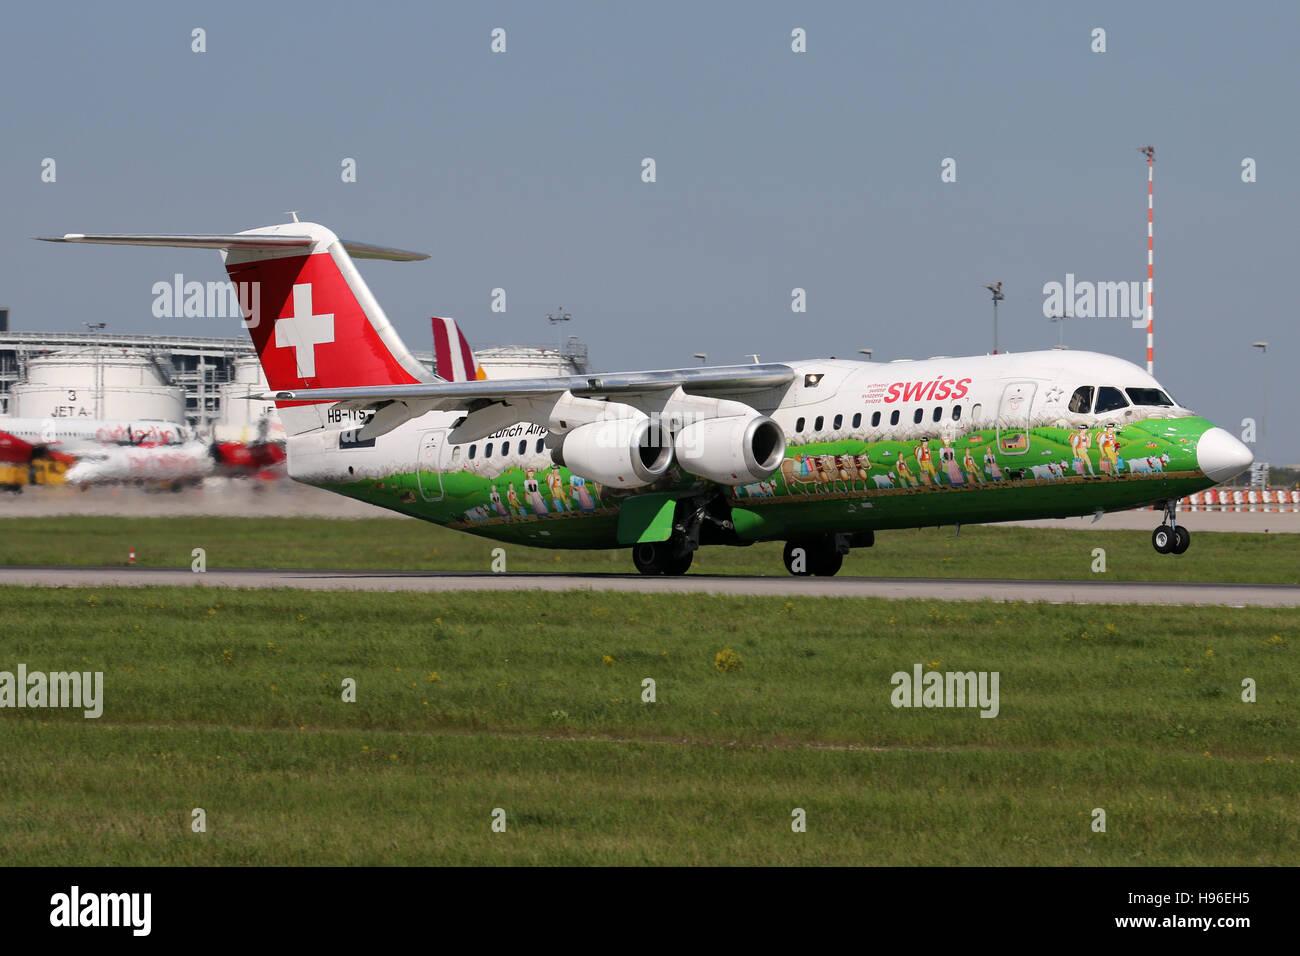 Stuttgart, Germany – May 05, 2016: Swiss International Airlines, BAE Avro at Stuttgart Airport - Stock Image